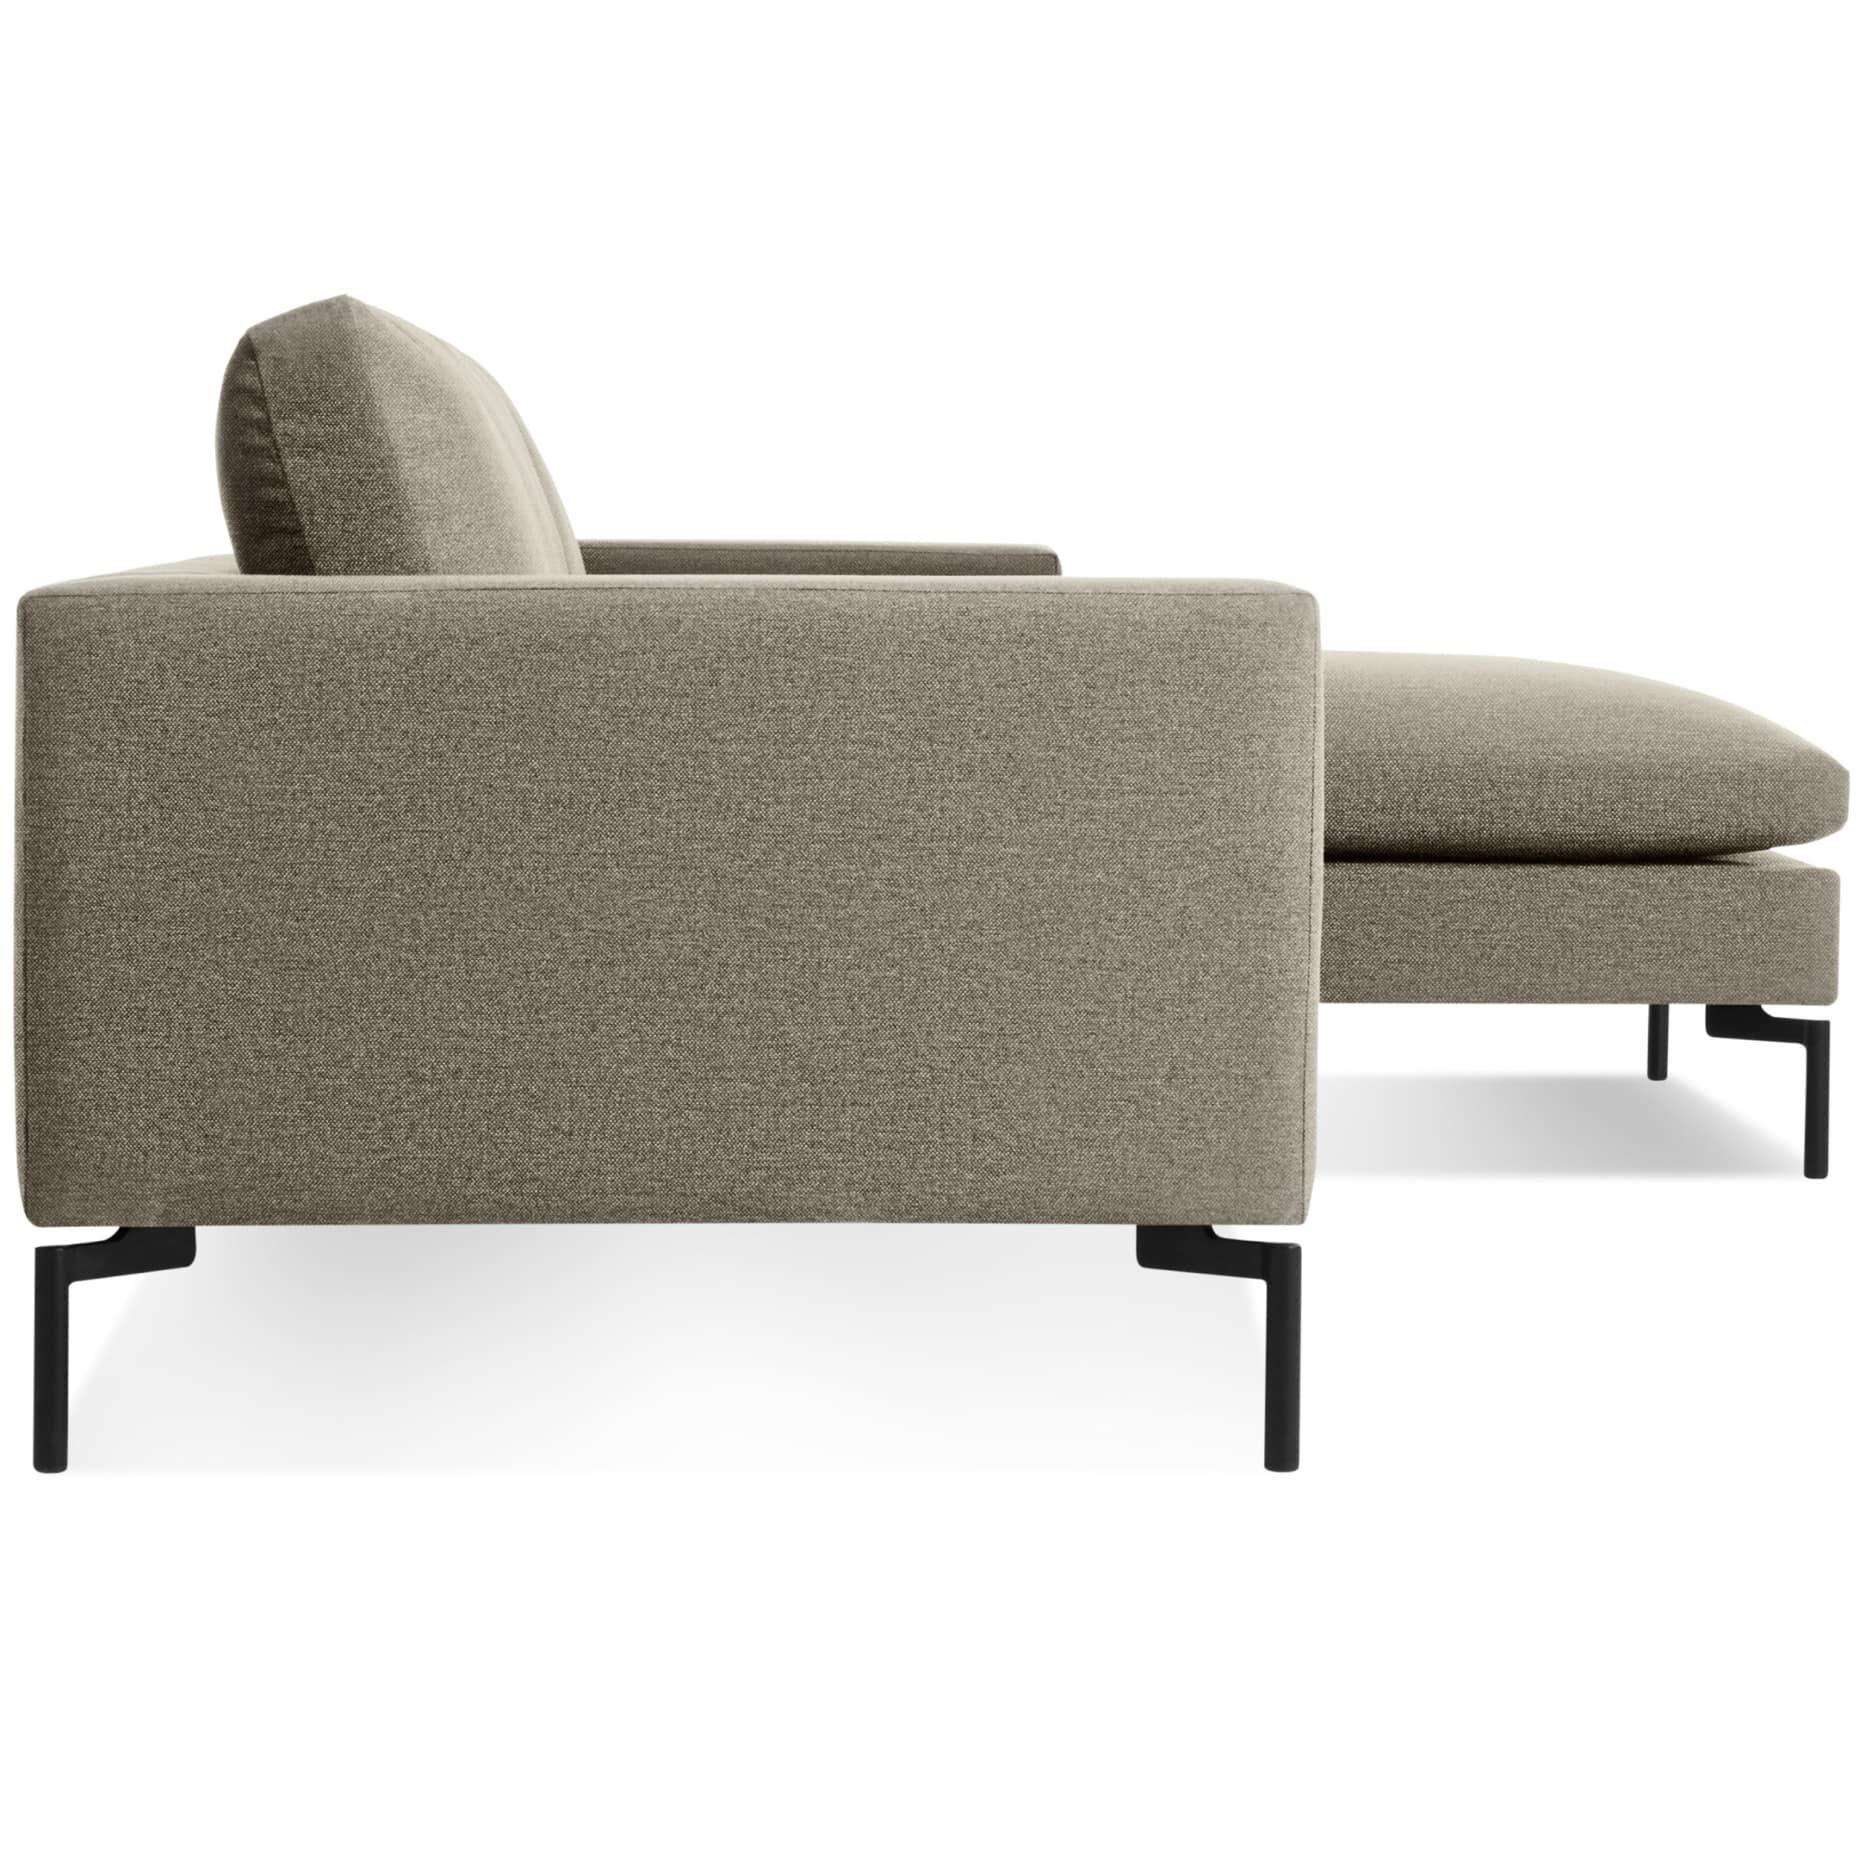 The New Standard Sofa W Right Arm Chaise Nixon Blue White Fabric Sofa Sofa Sectional Sofa